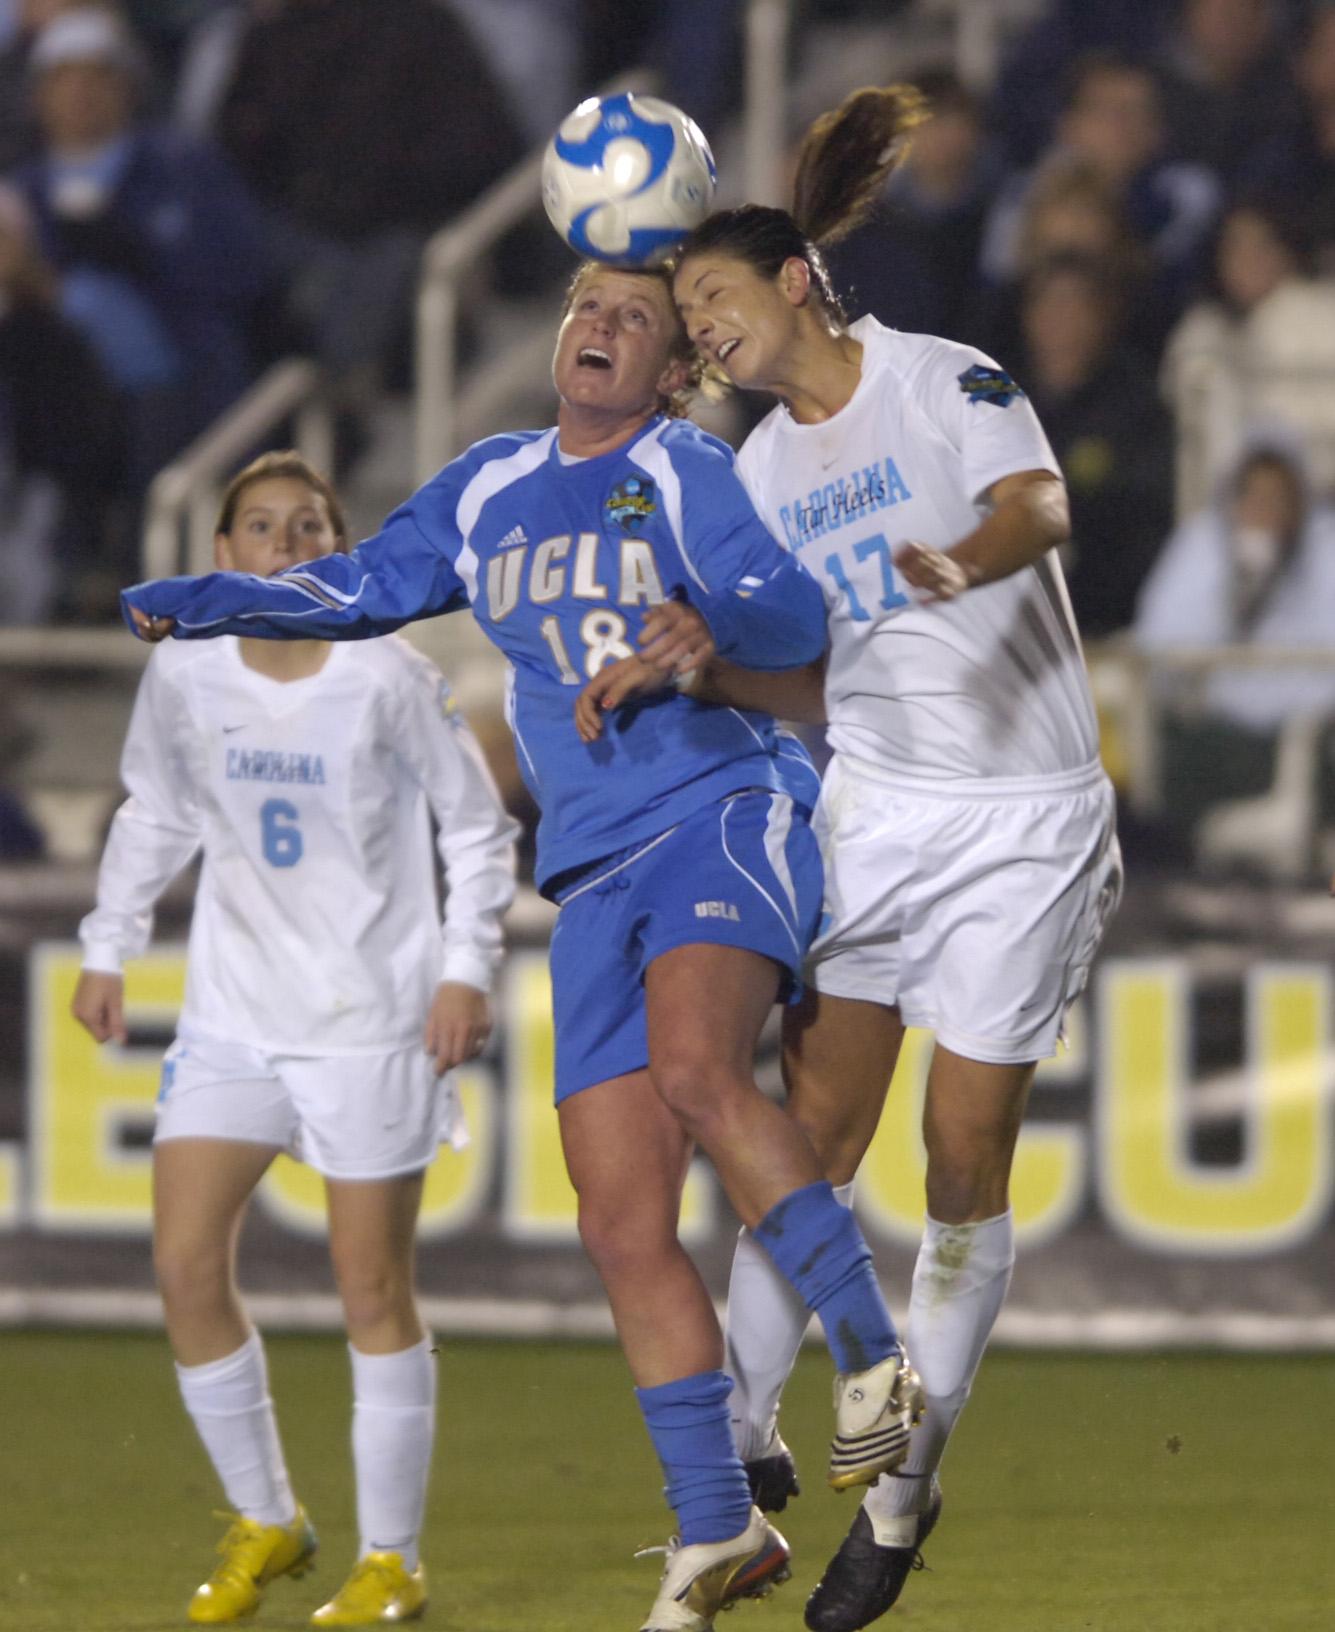 University of North Carolina Women's Soccer v UCLA First Half National Semi-Final Wake Med Soccer Park Cary, NC Friday, November 5, 2008